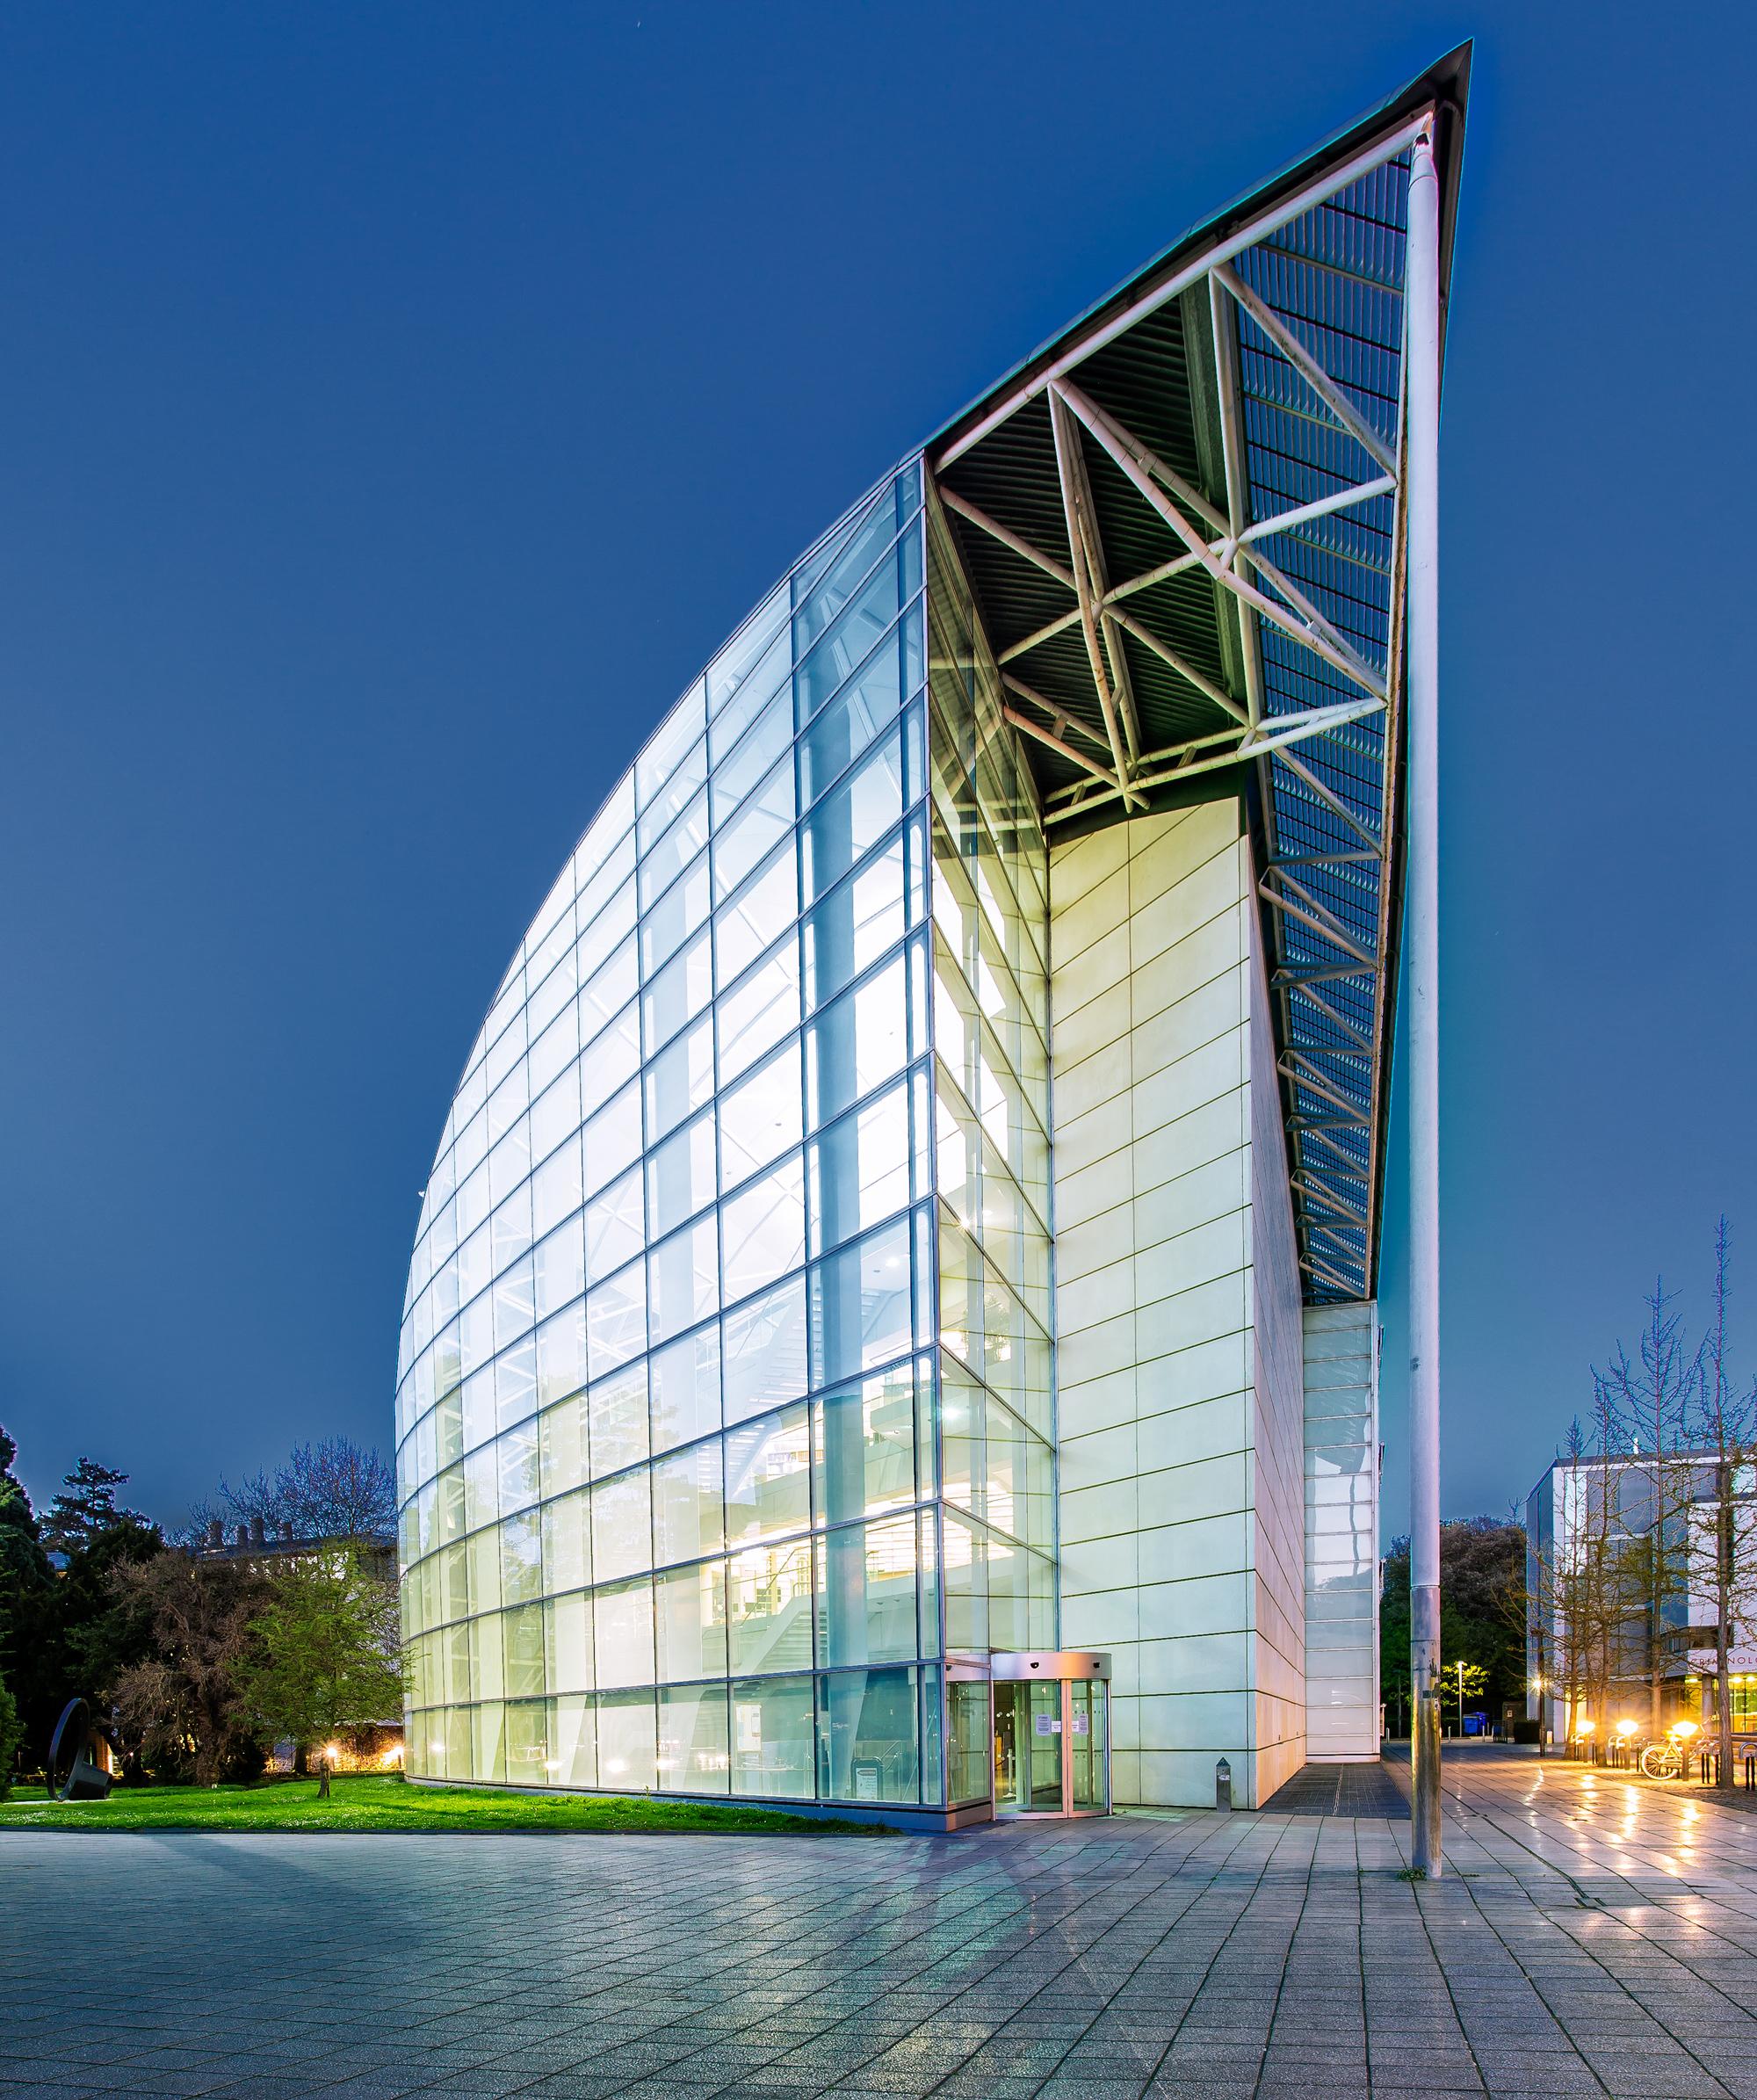 Faculty of Law, Cambridge